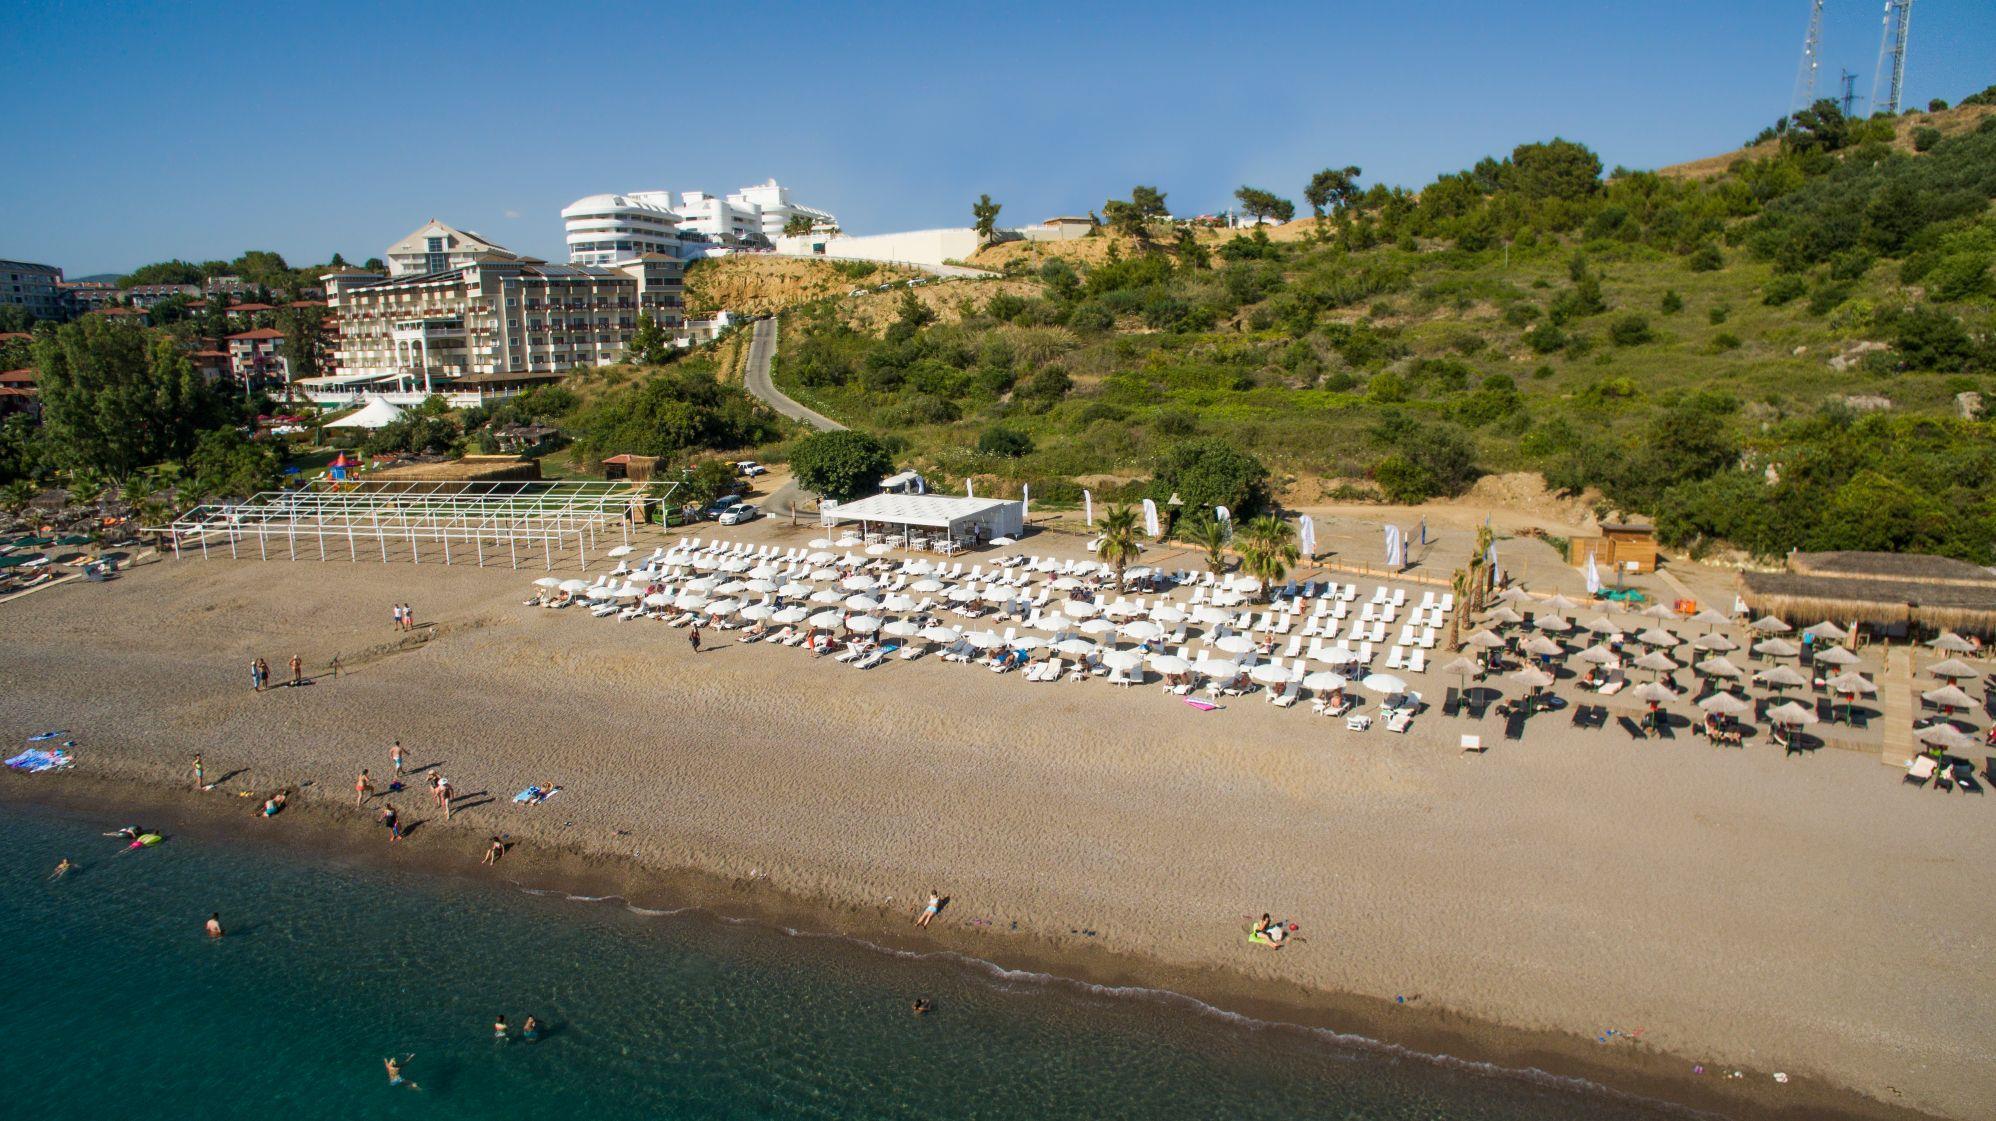 http://www.orextravel.sk/OREX/hotelphotos/laguna-beach-alya-general-0022.jpg